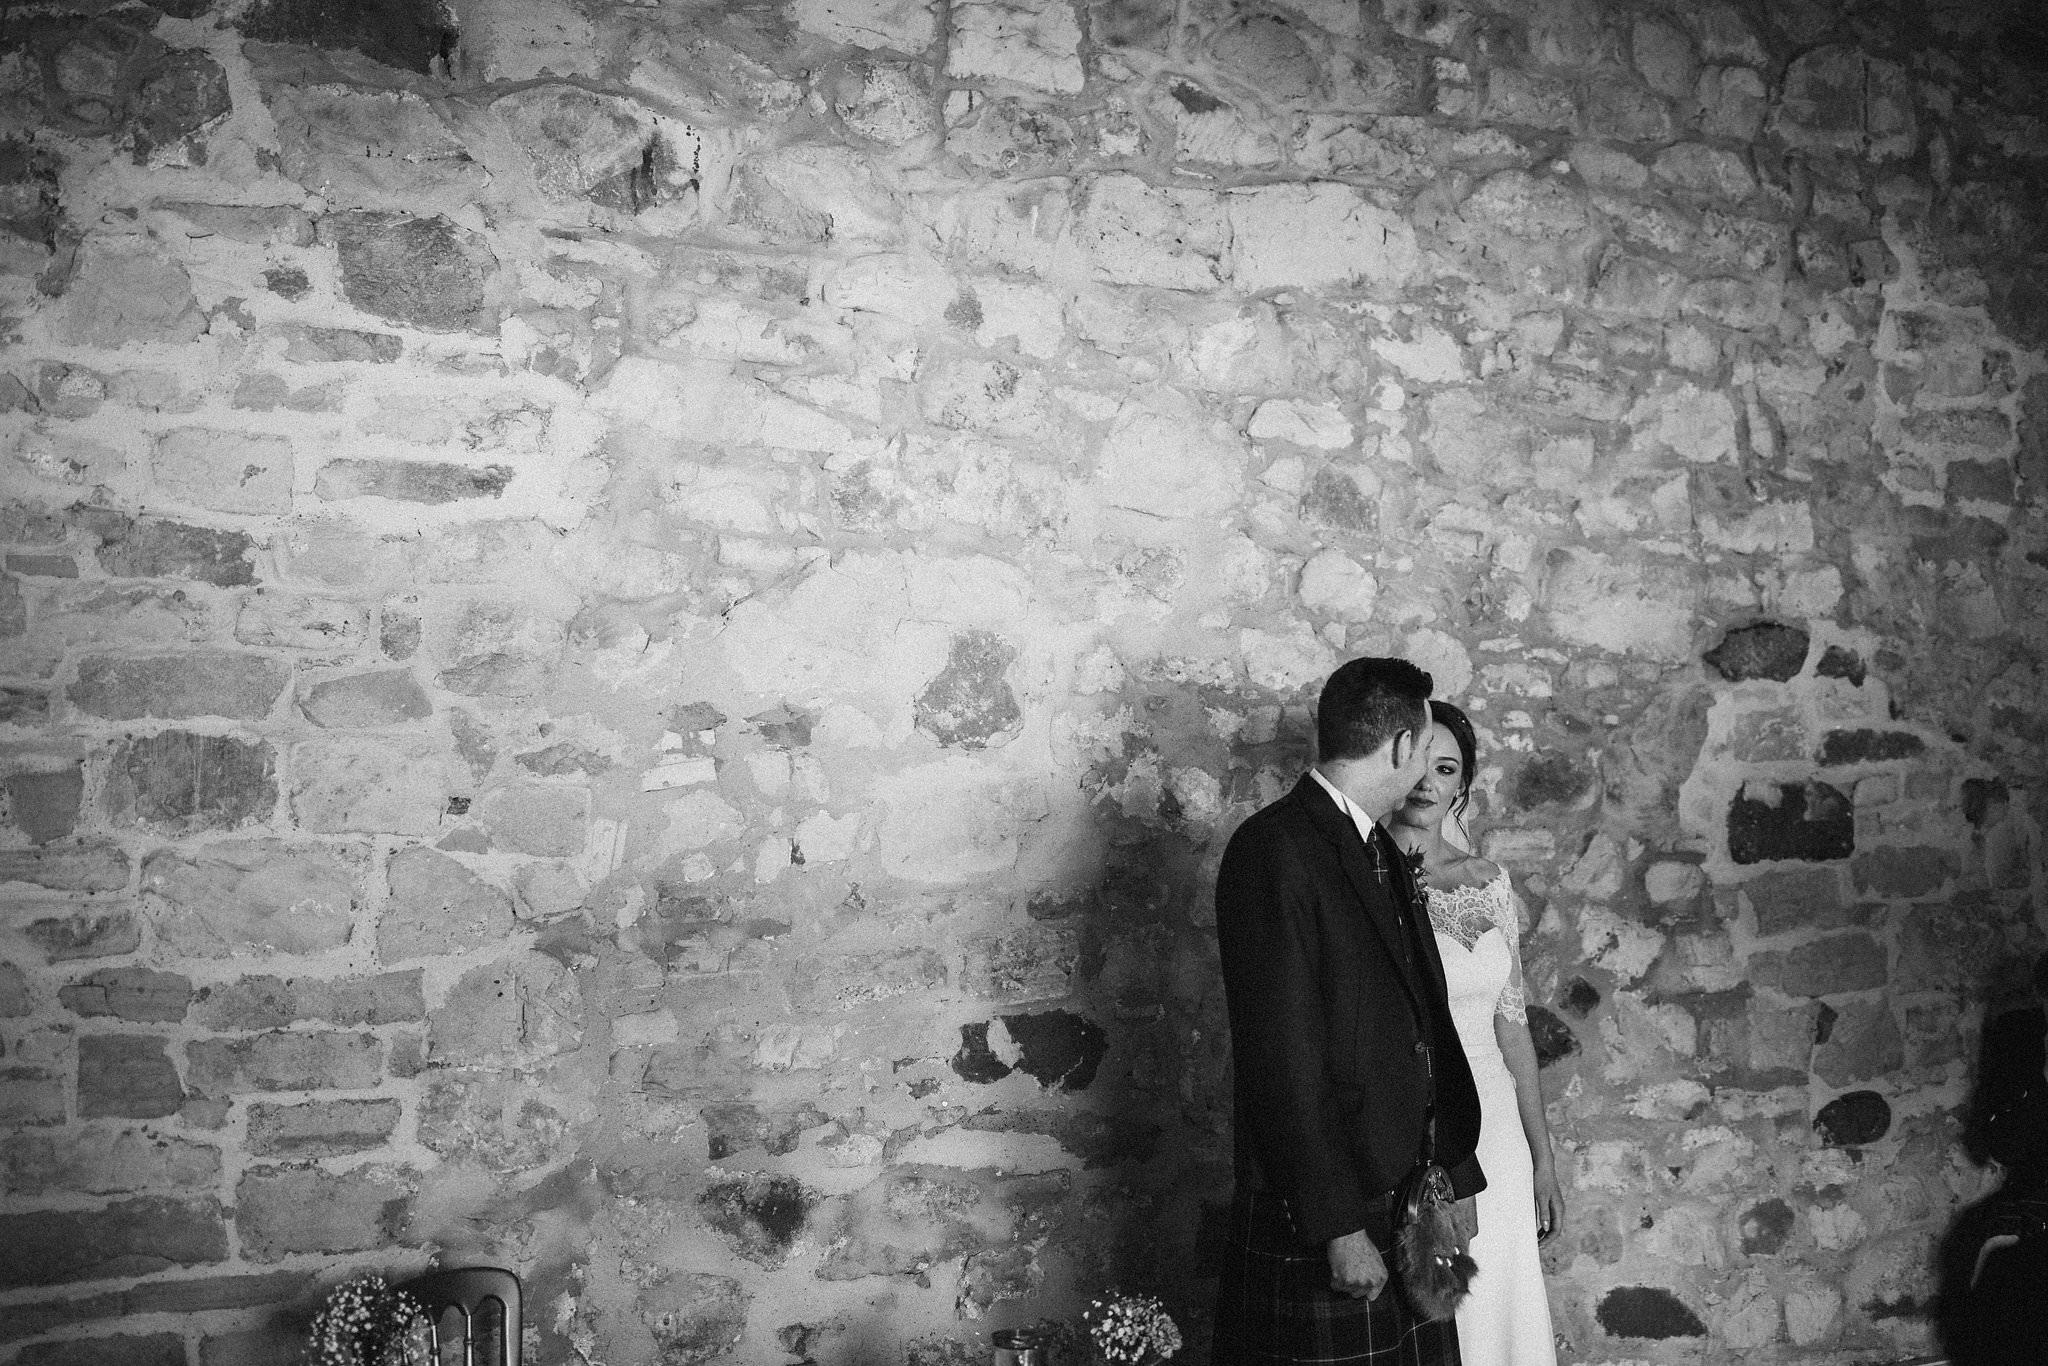 kirknewton stables wedding photographer (41).jpg